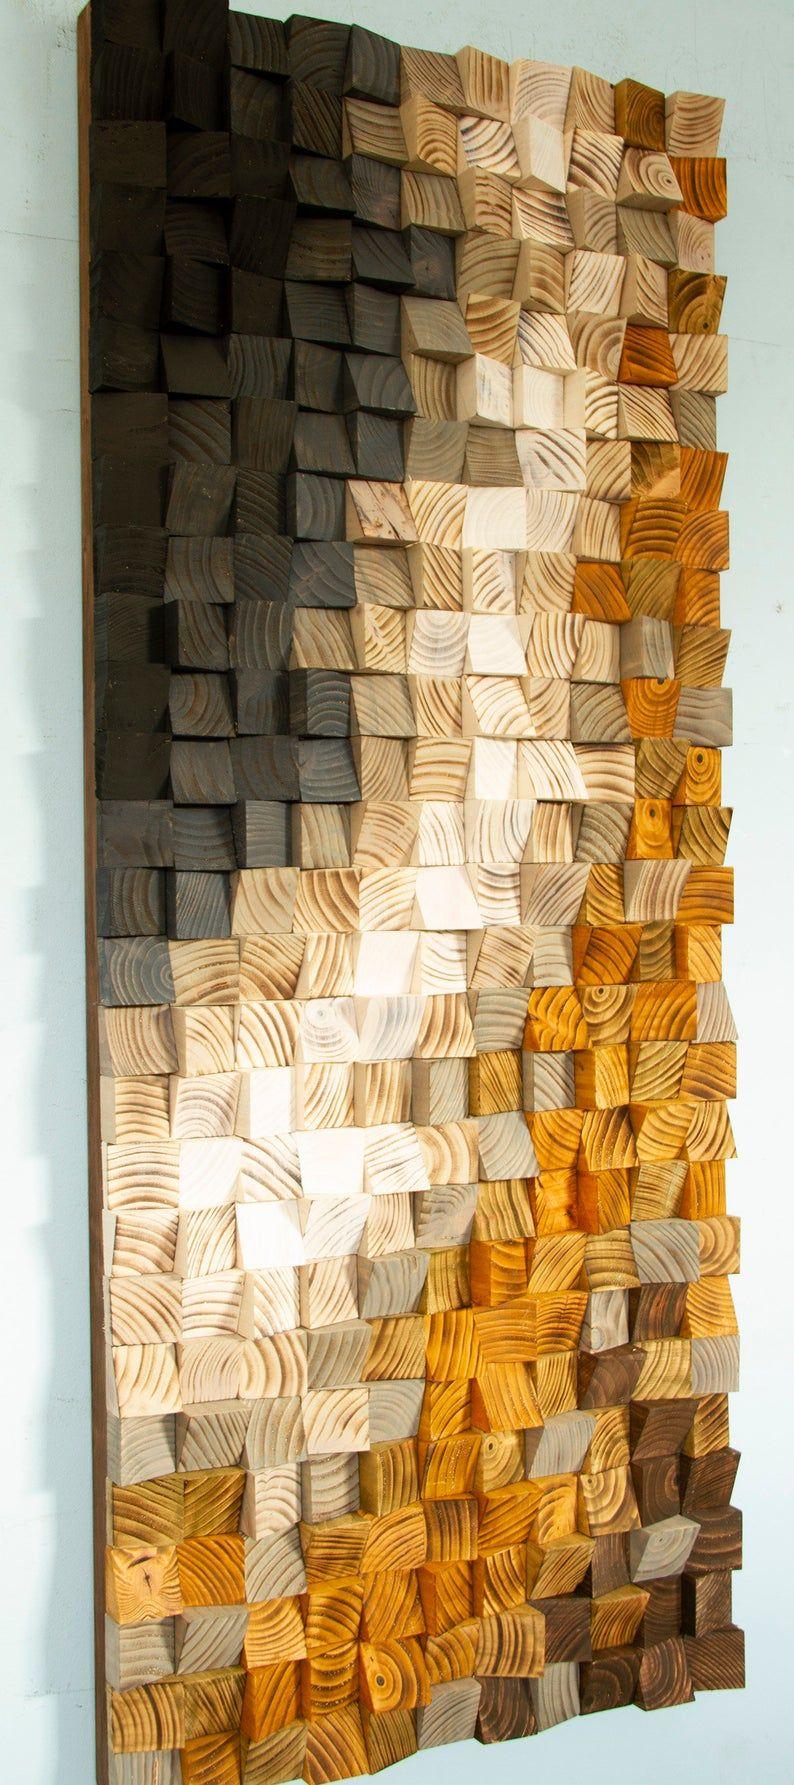 Reclaimed Wood wall Art, Black River, wood mosaic, geometric art #reclaimedwoodwallart